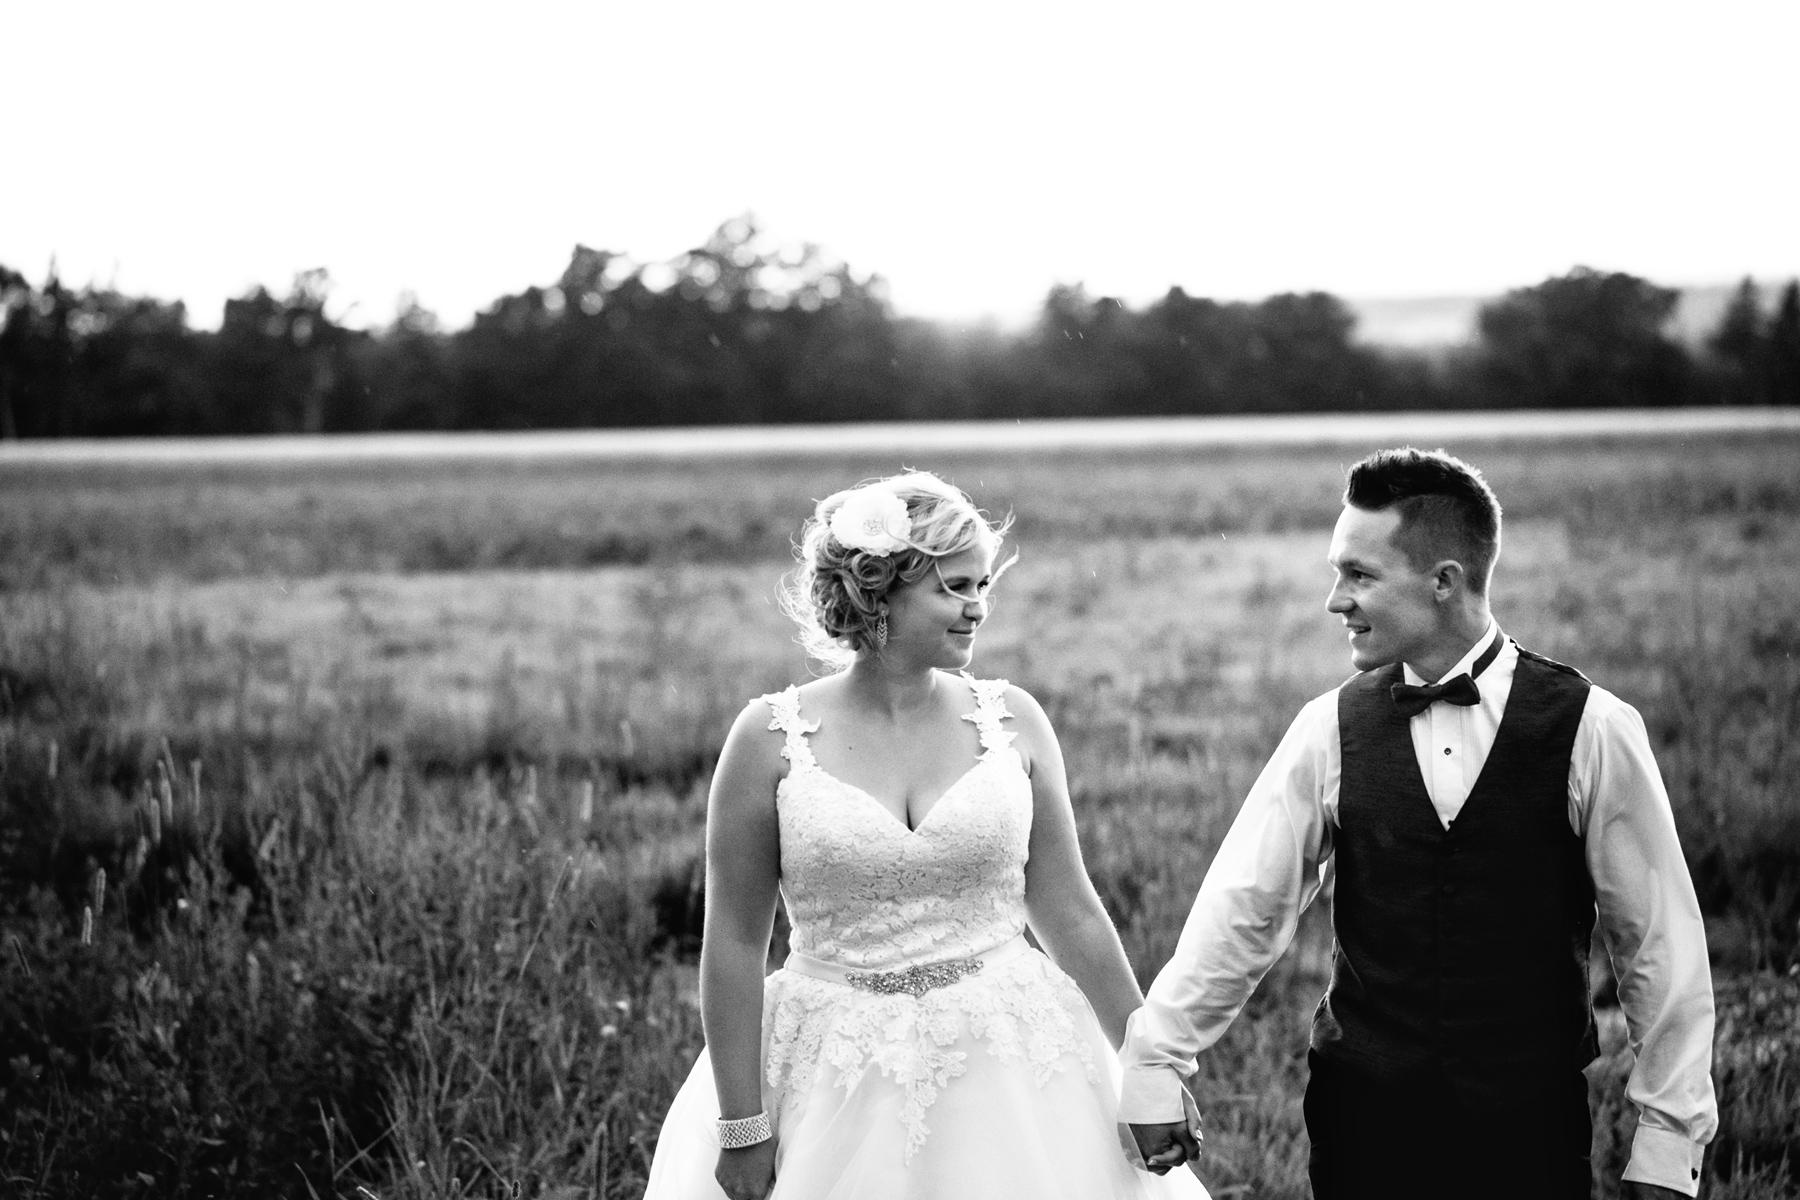 063-awesome-pei-wedding-photography-kandisebrown-jg2016